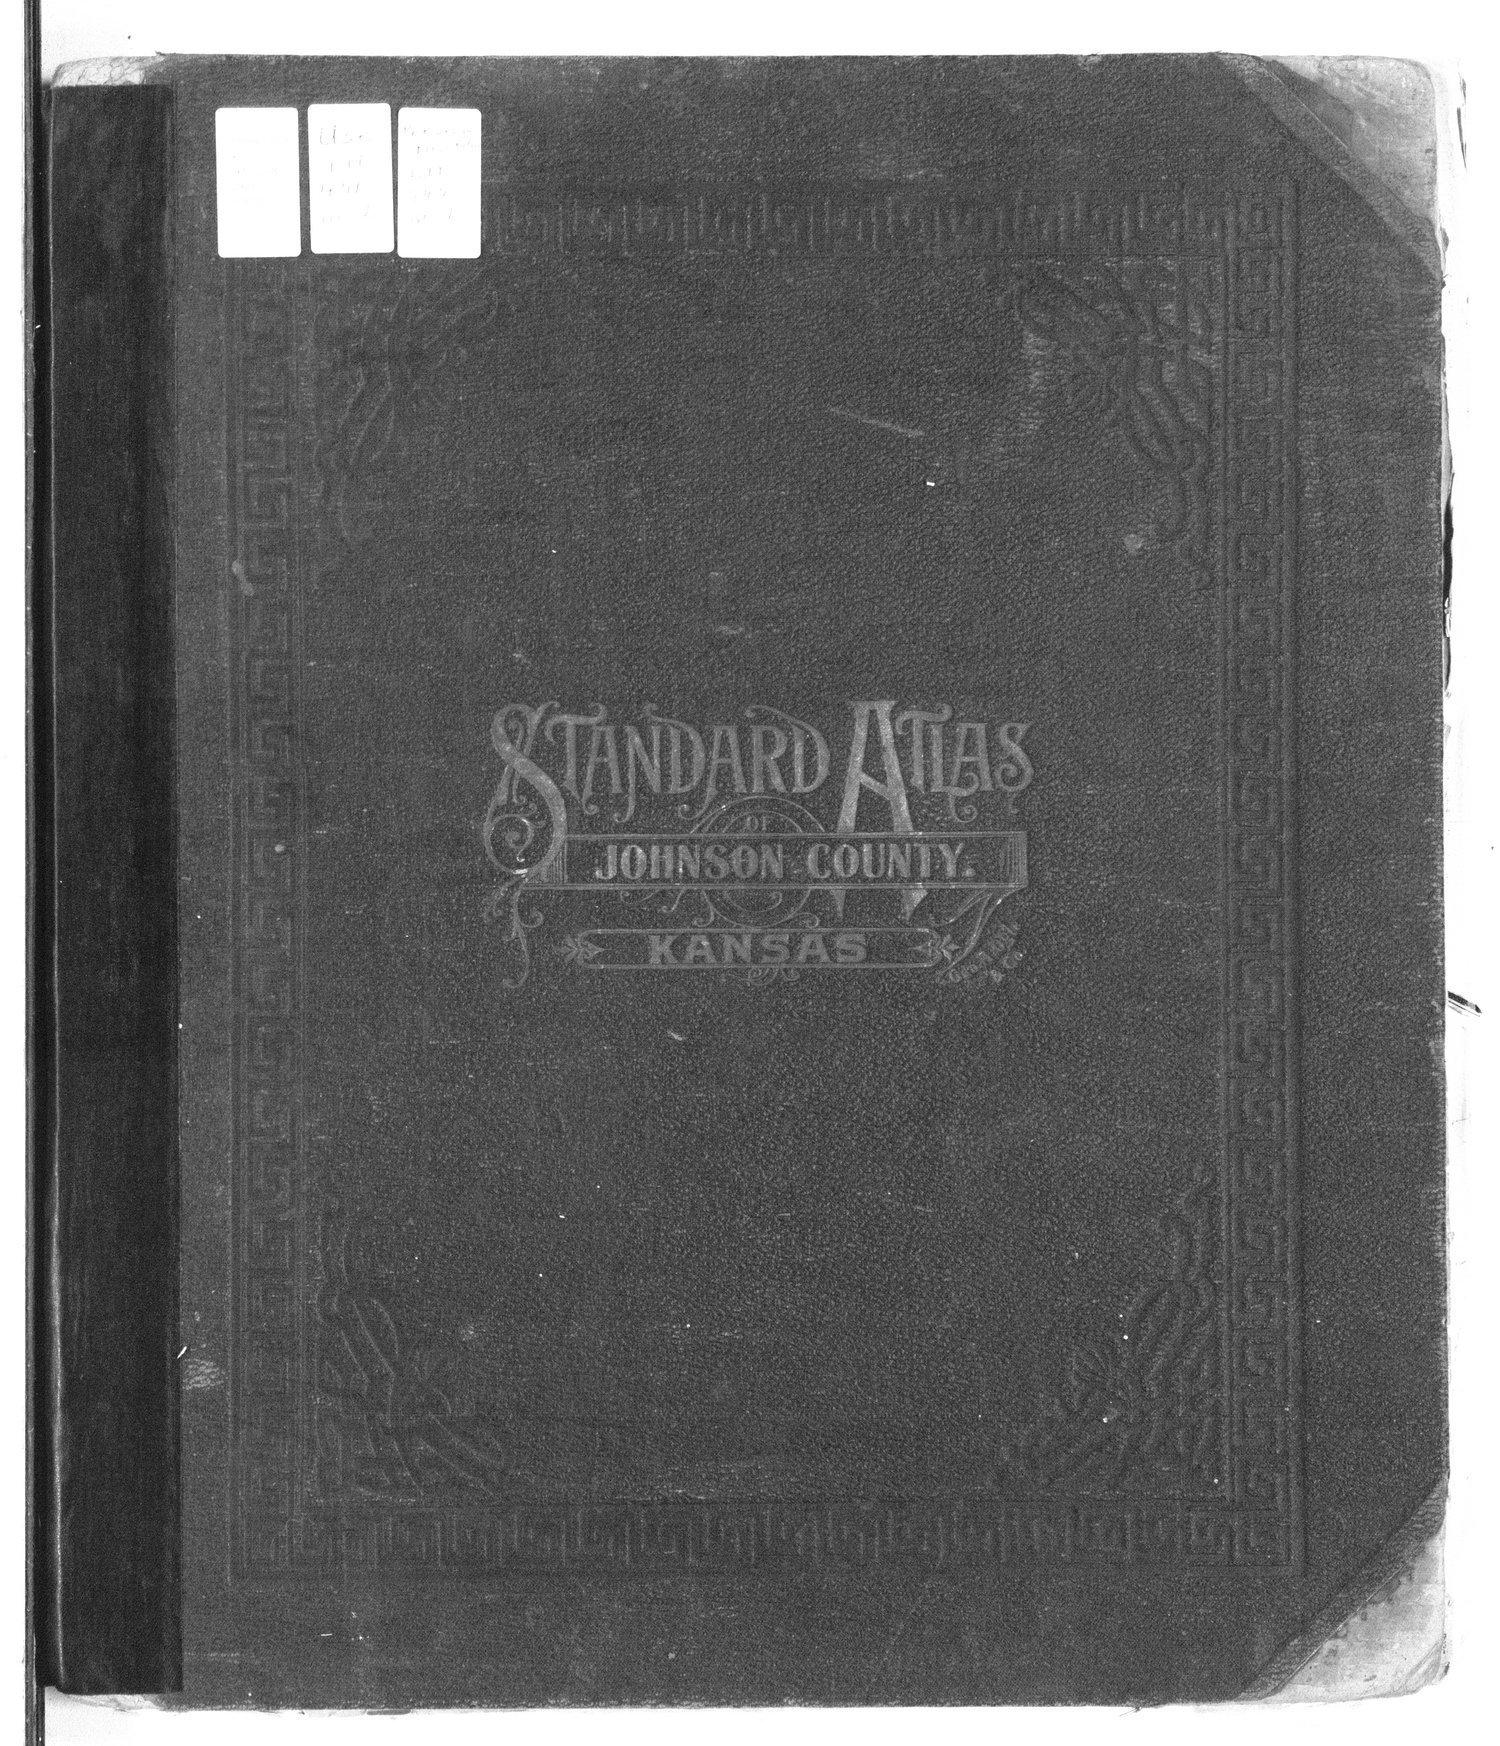 Standard atlas of Johnson County, Kansas - Front Cover